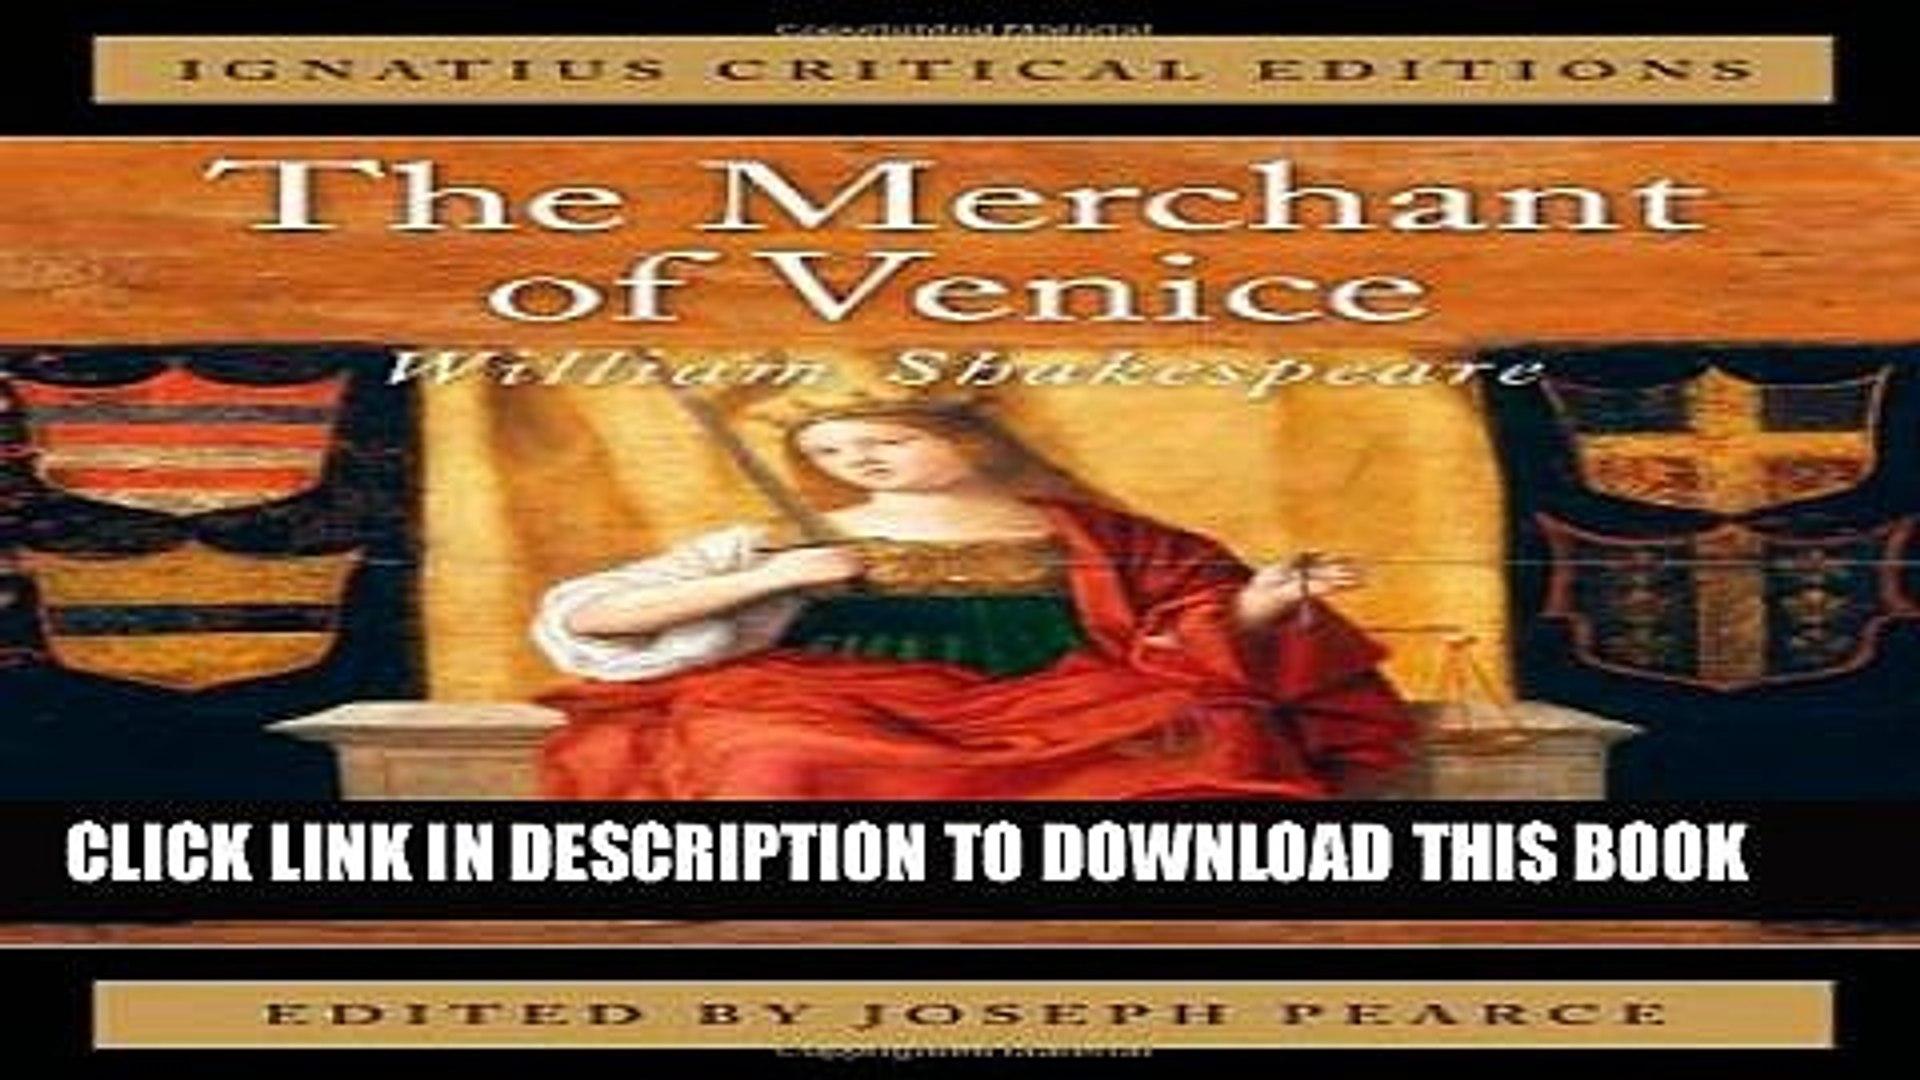 Collection Book The Merchant of Venice: Ignatius Critical Editions